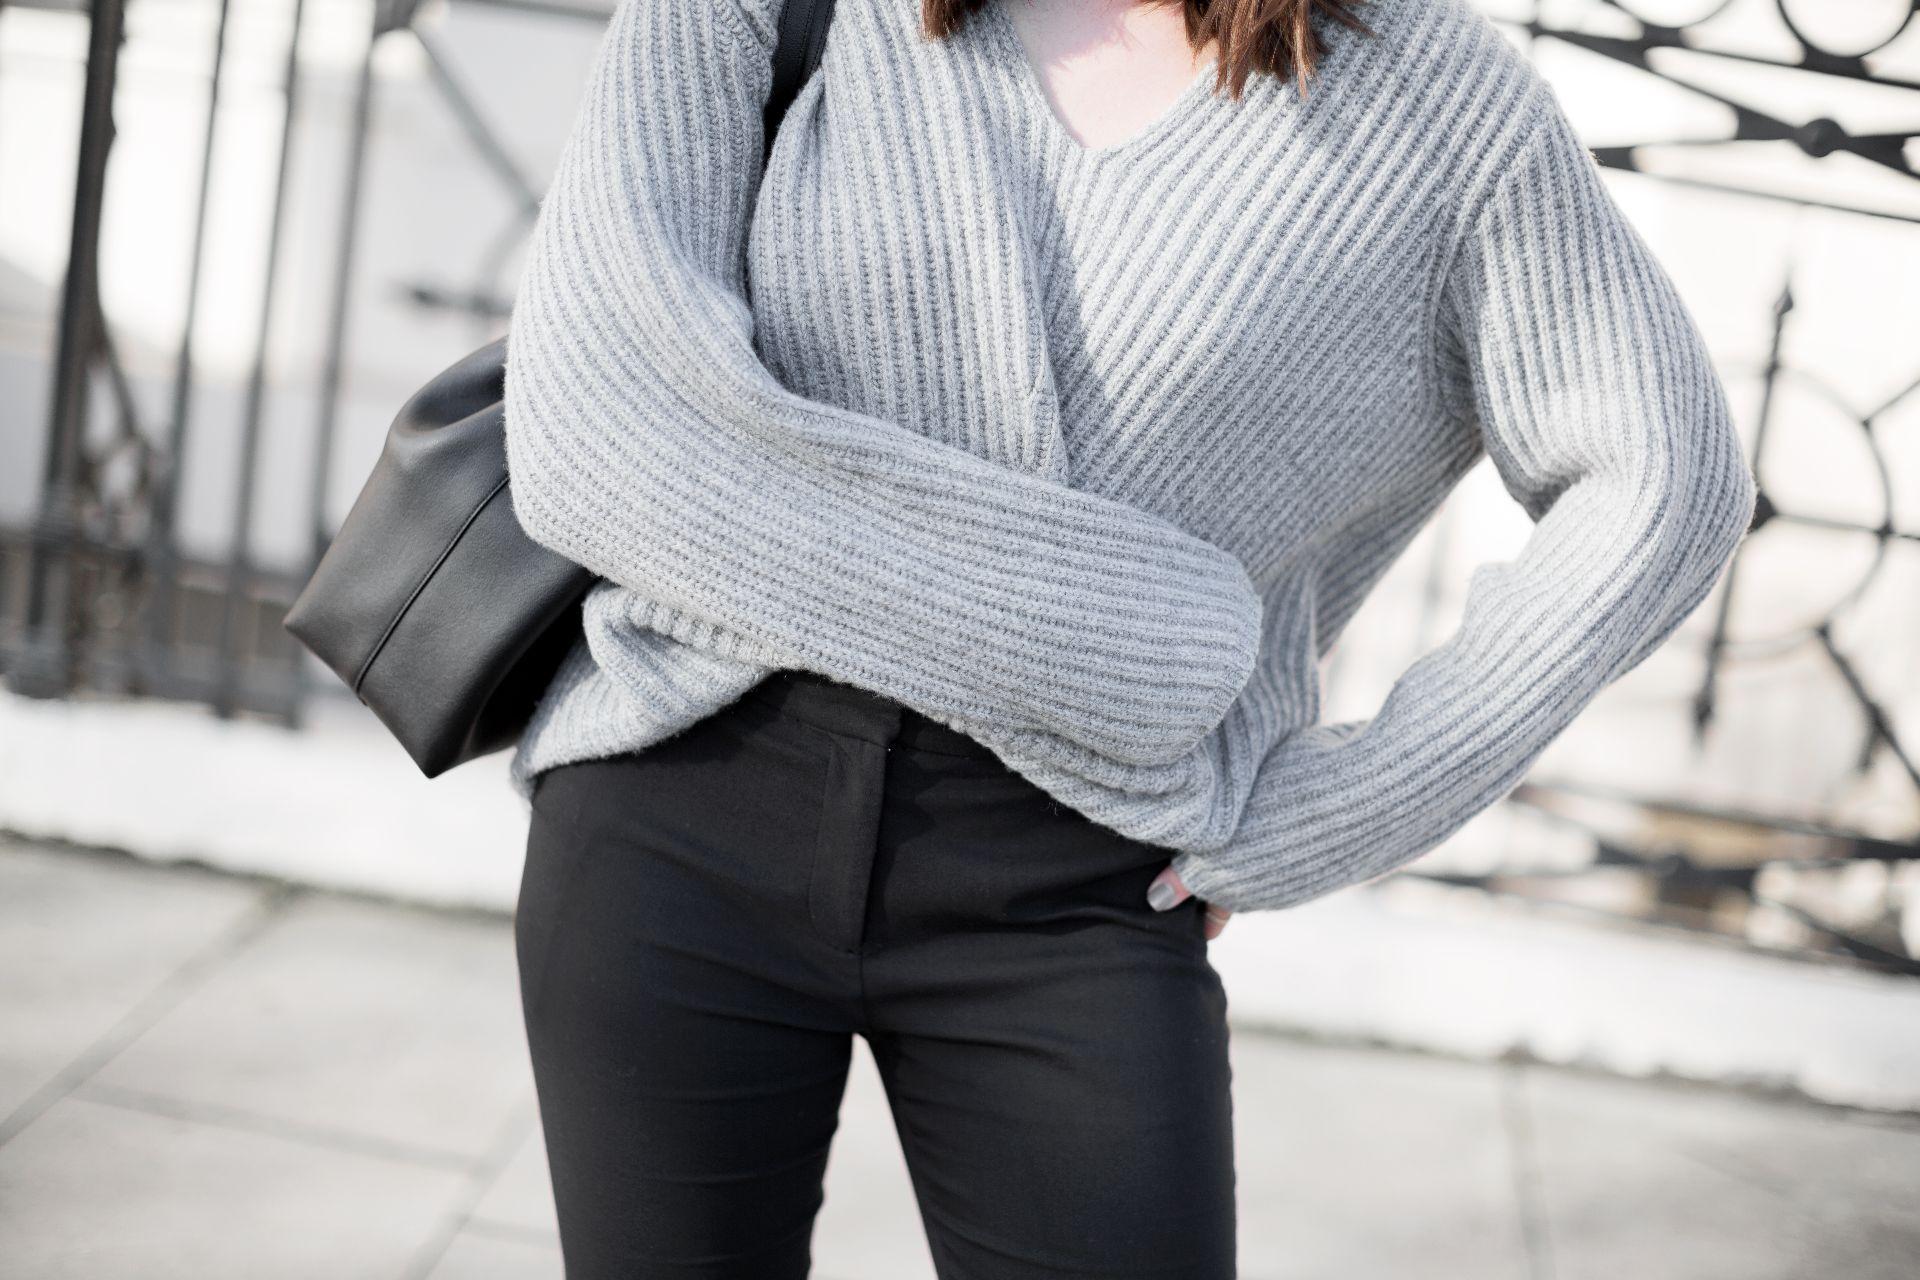 theannaedit-workwear-fashion-edit-january-2018-8